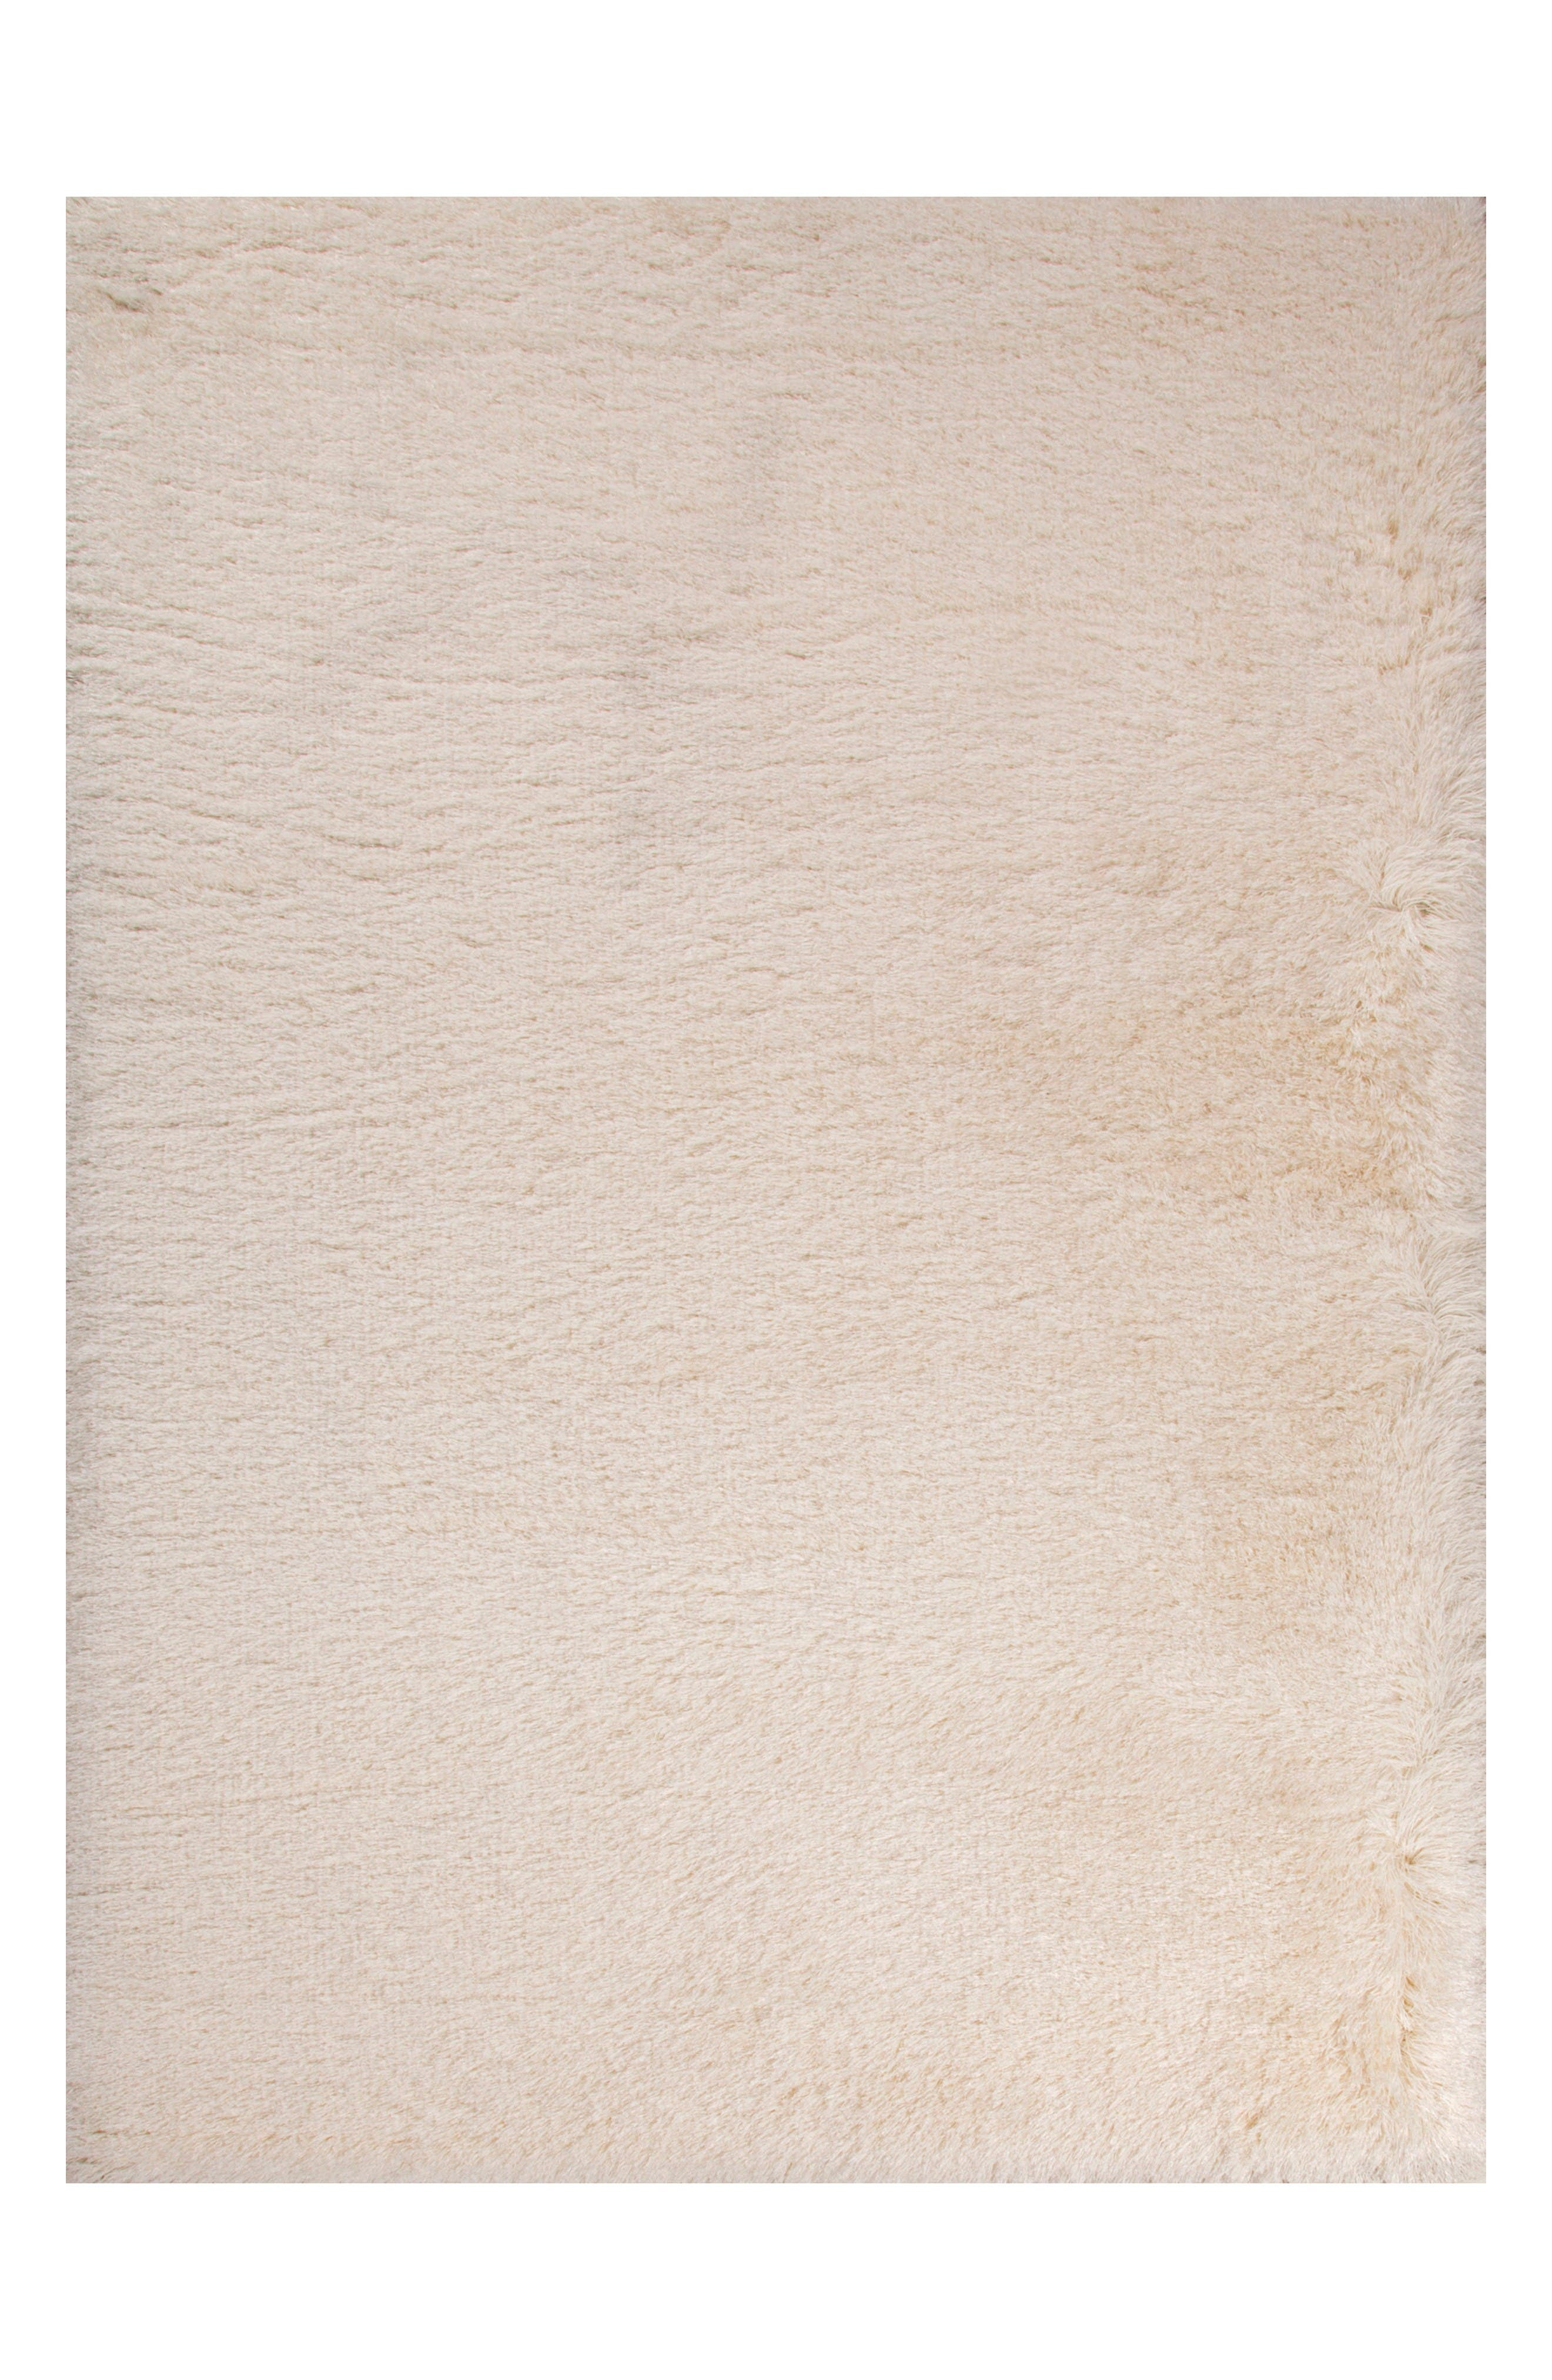 Alternate Image 1 Selected - Jaipur Shag Rug